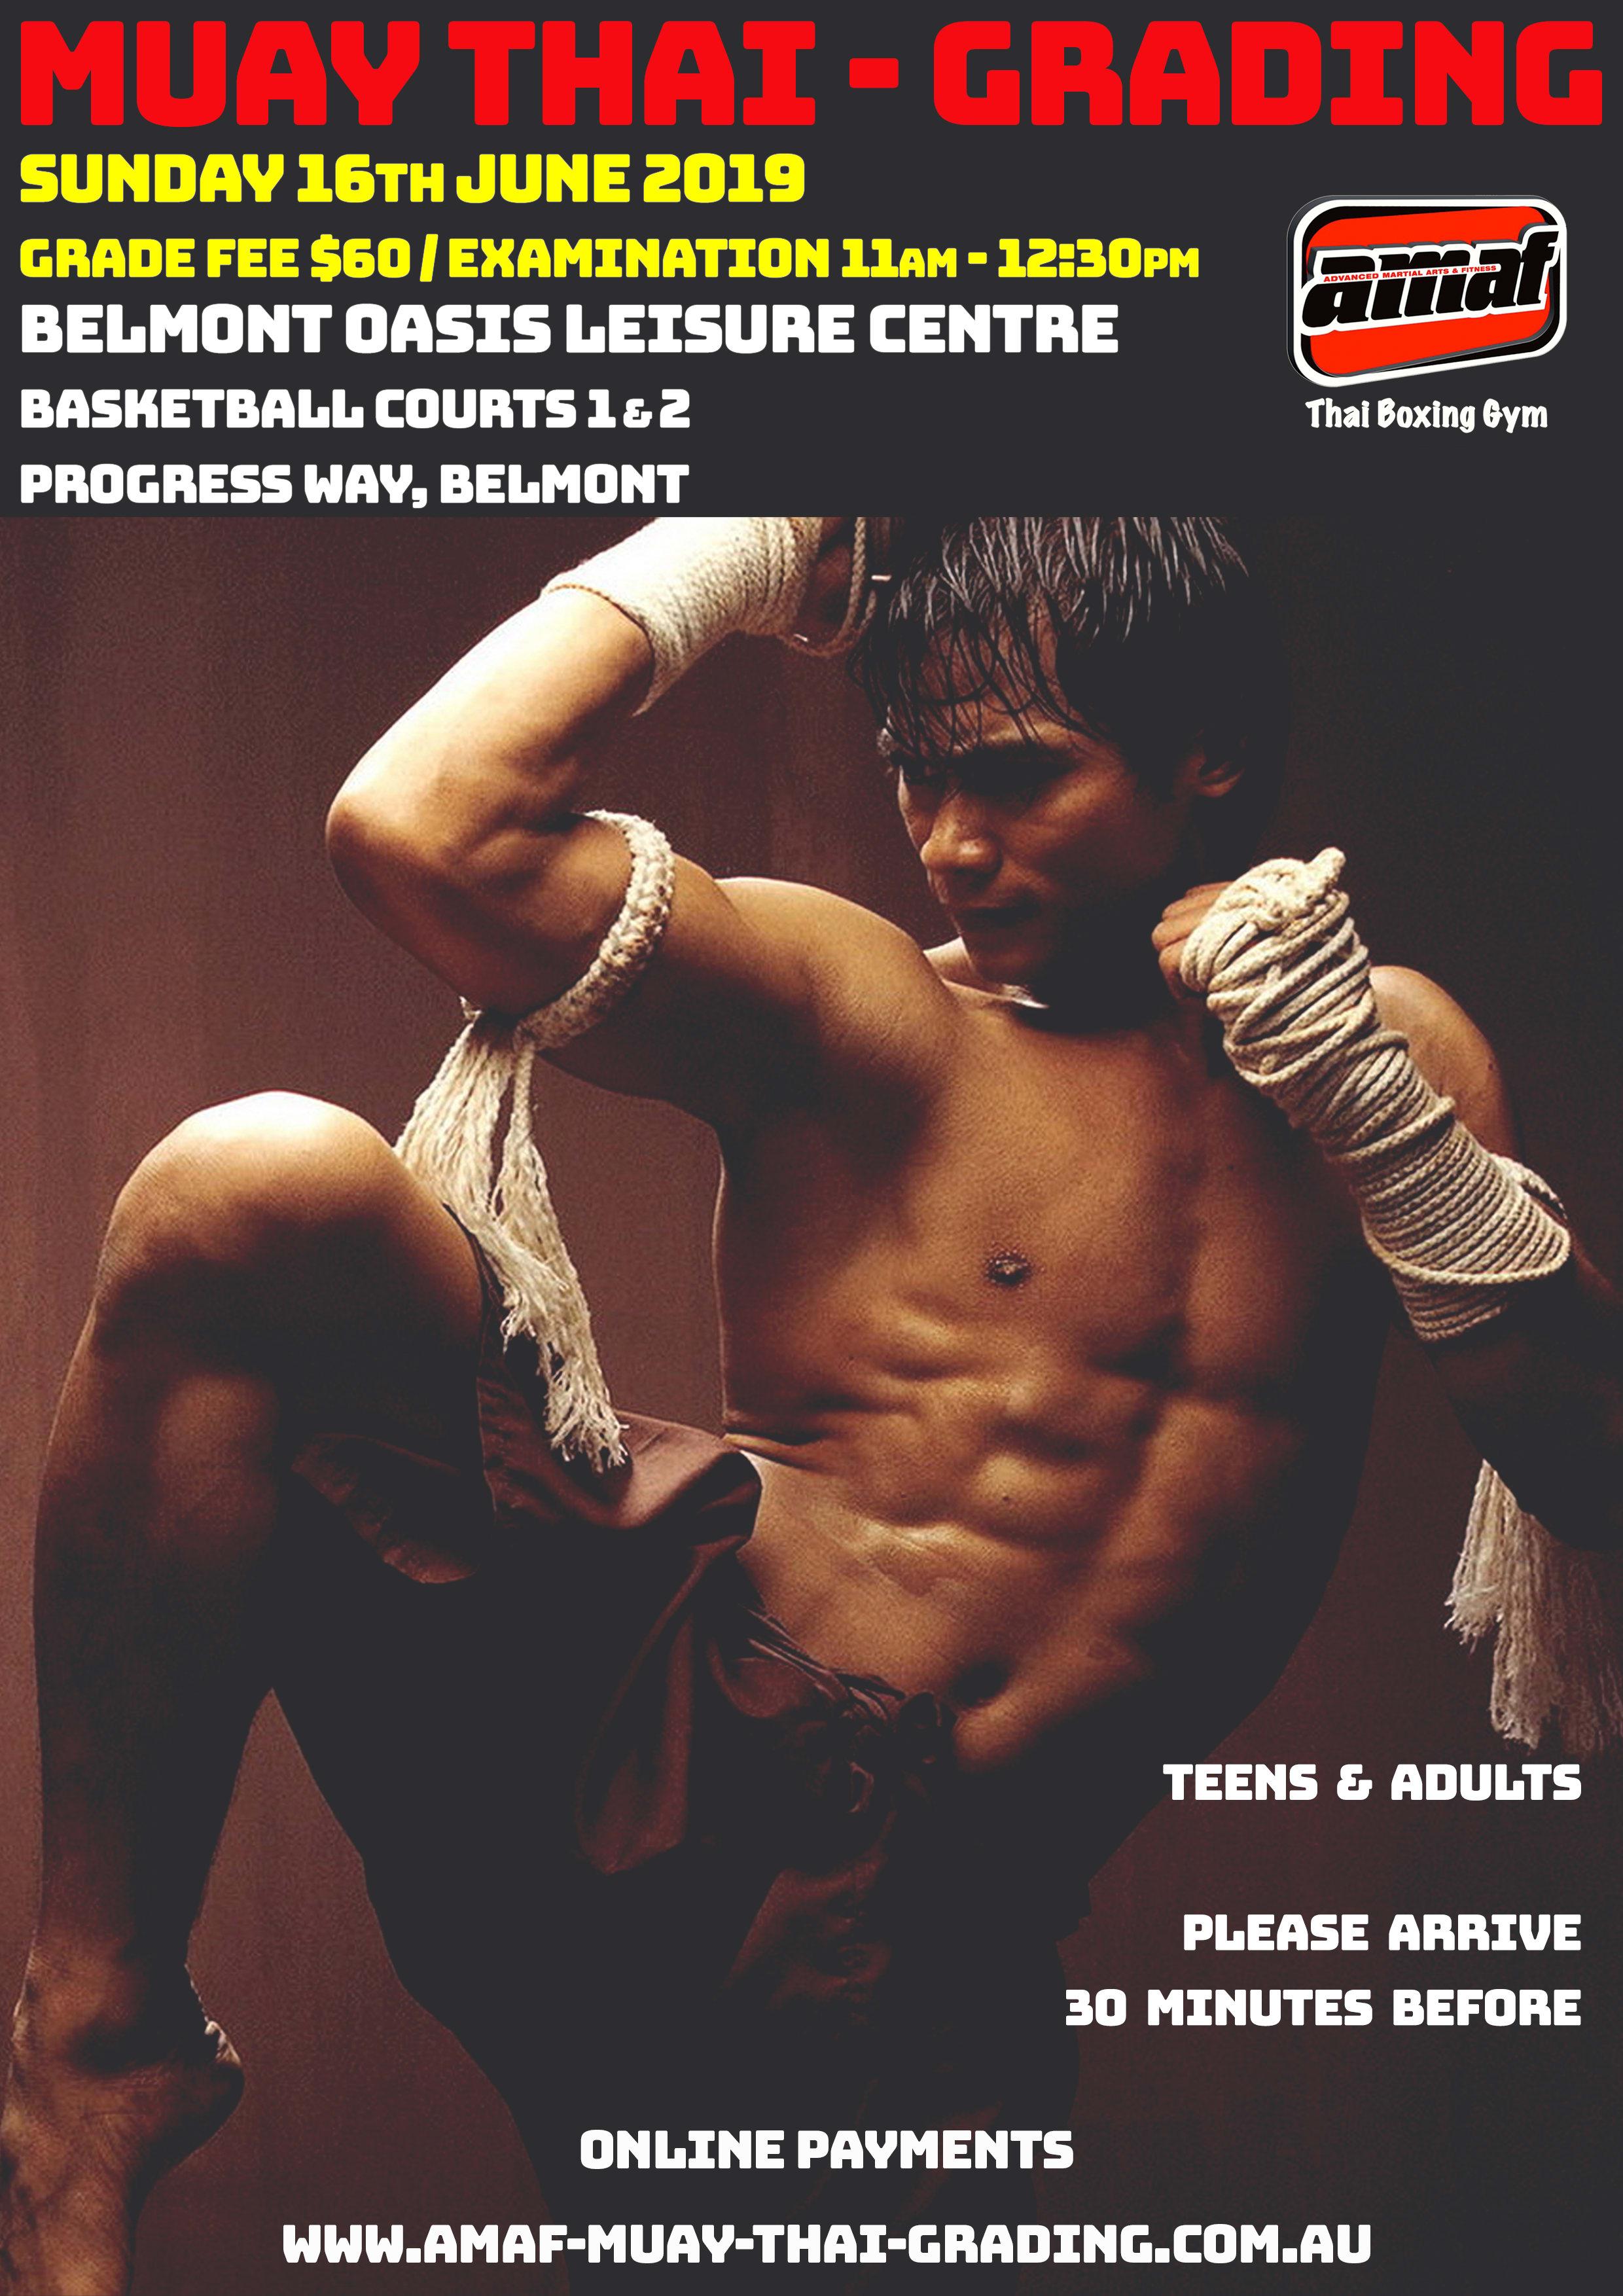 MUAY THAI GRADING in East Victoria Park - Advanced Martial Arts & Fitness